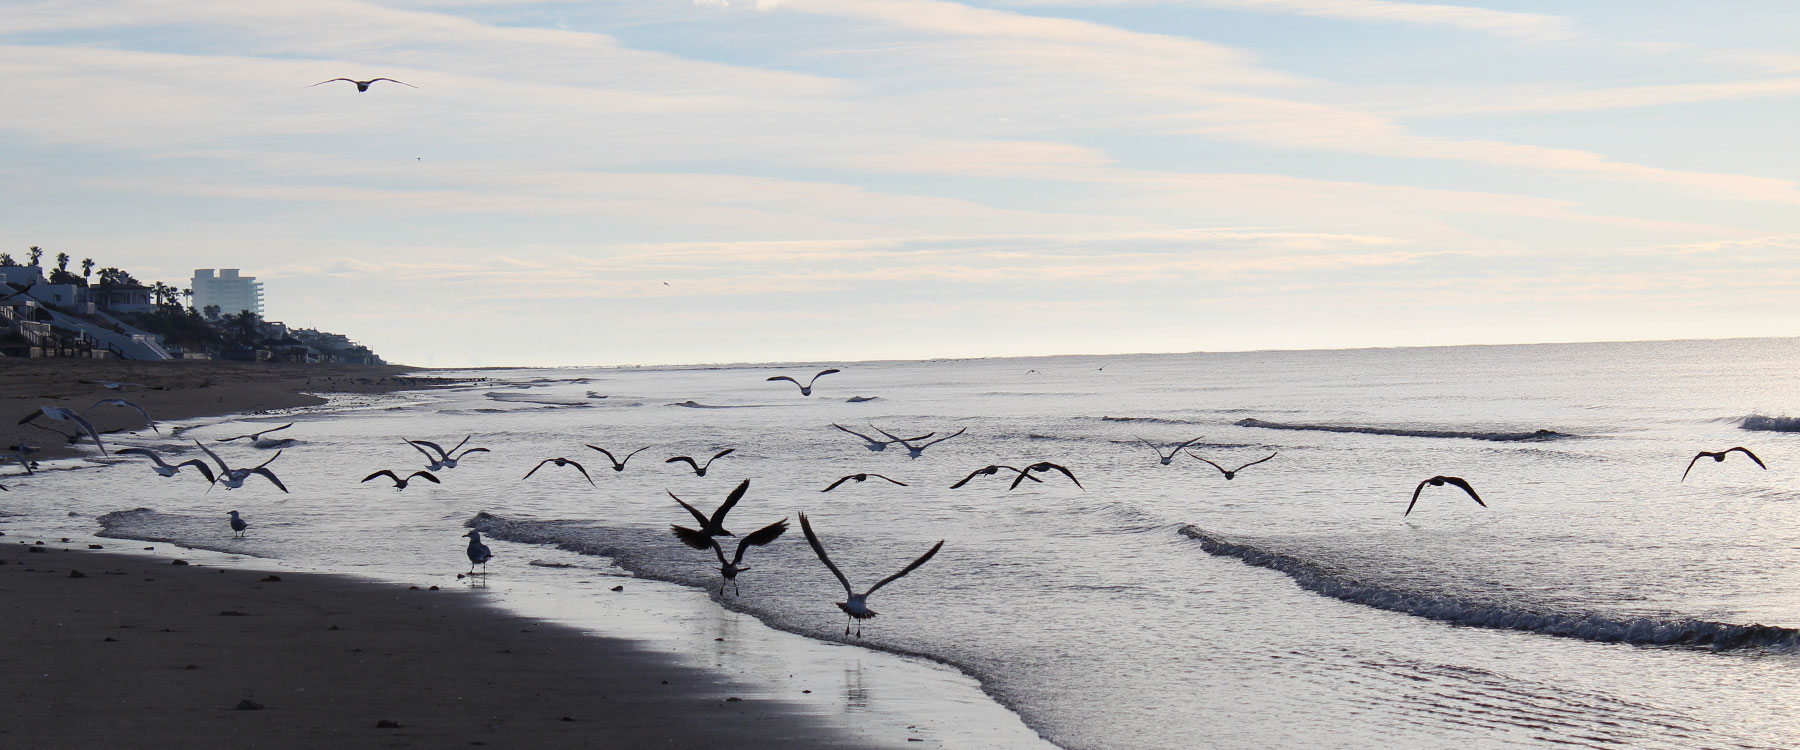 Gulls Skim Seaside at Sunrise in Puerto Penasco Mexico.